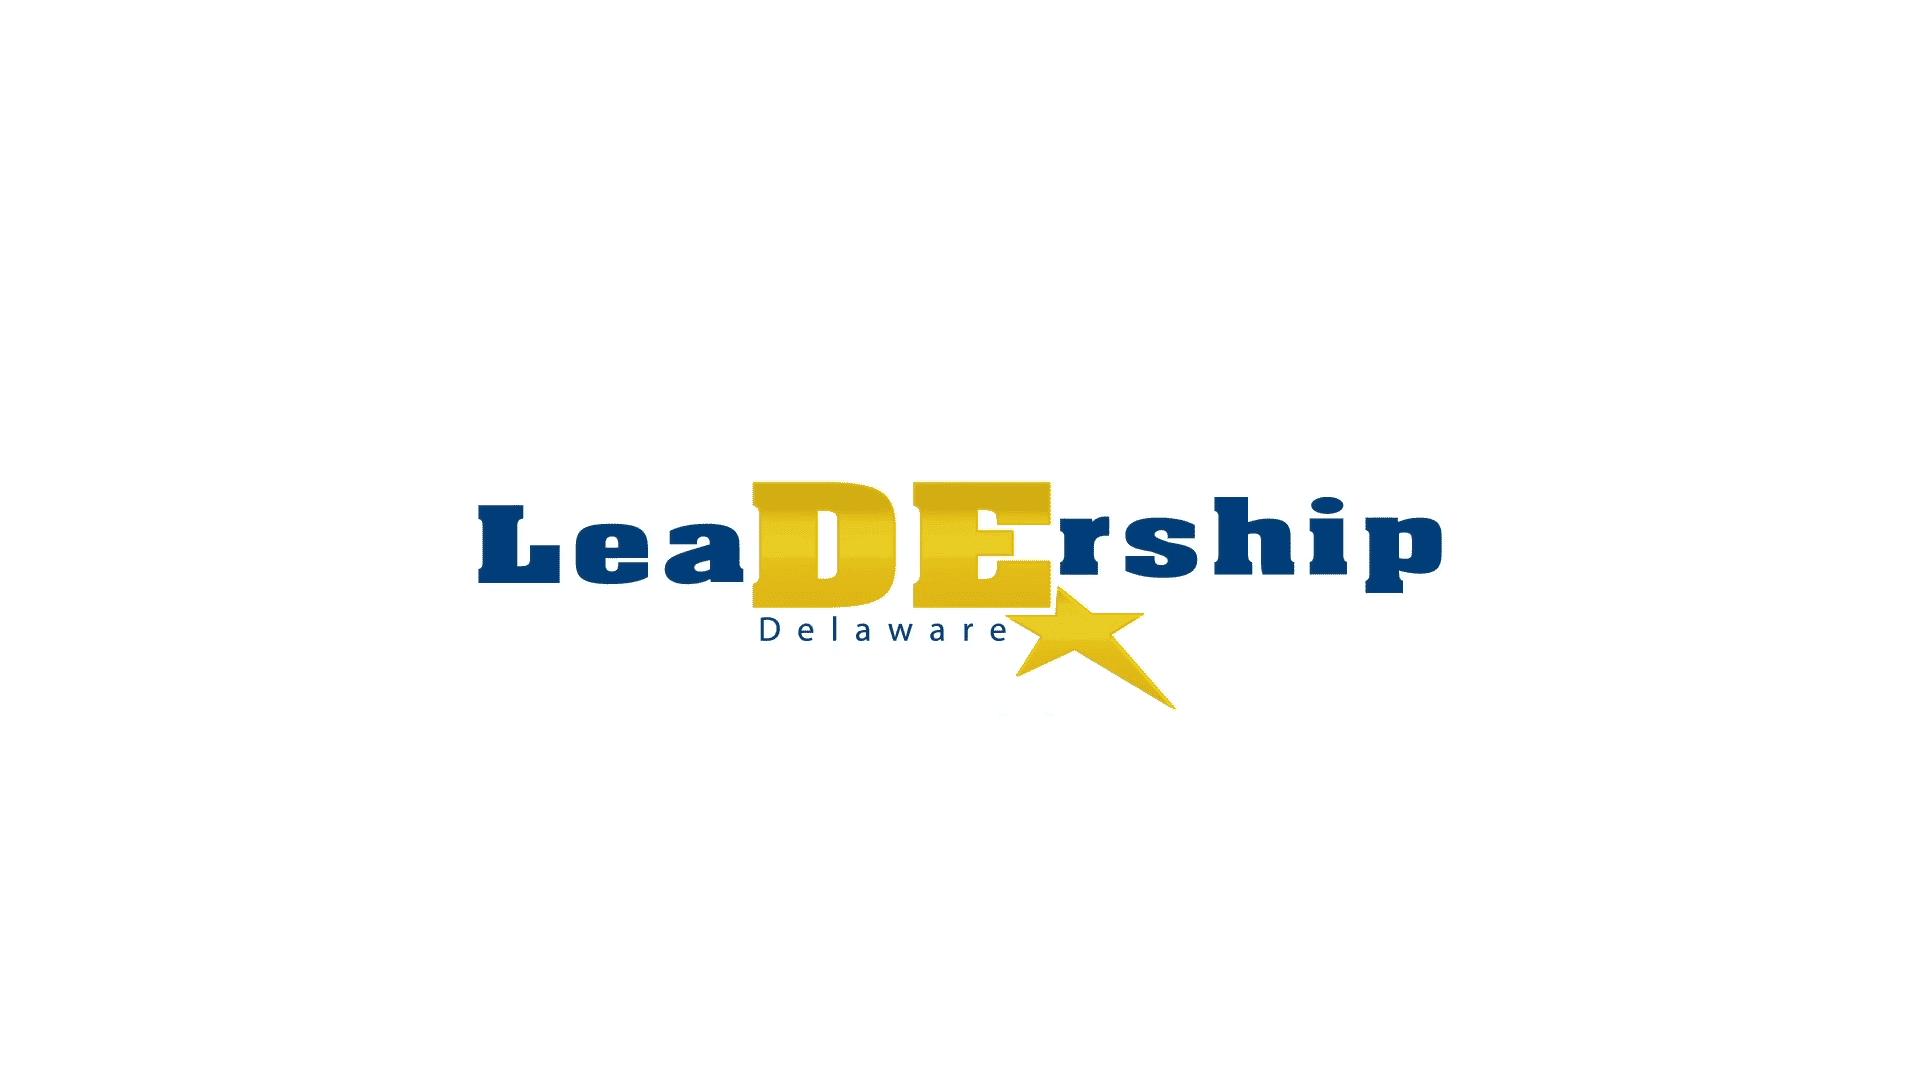 Leadership Delaware